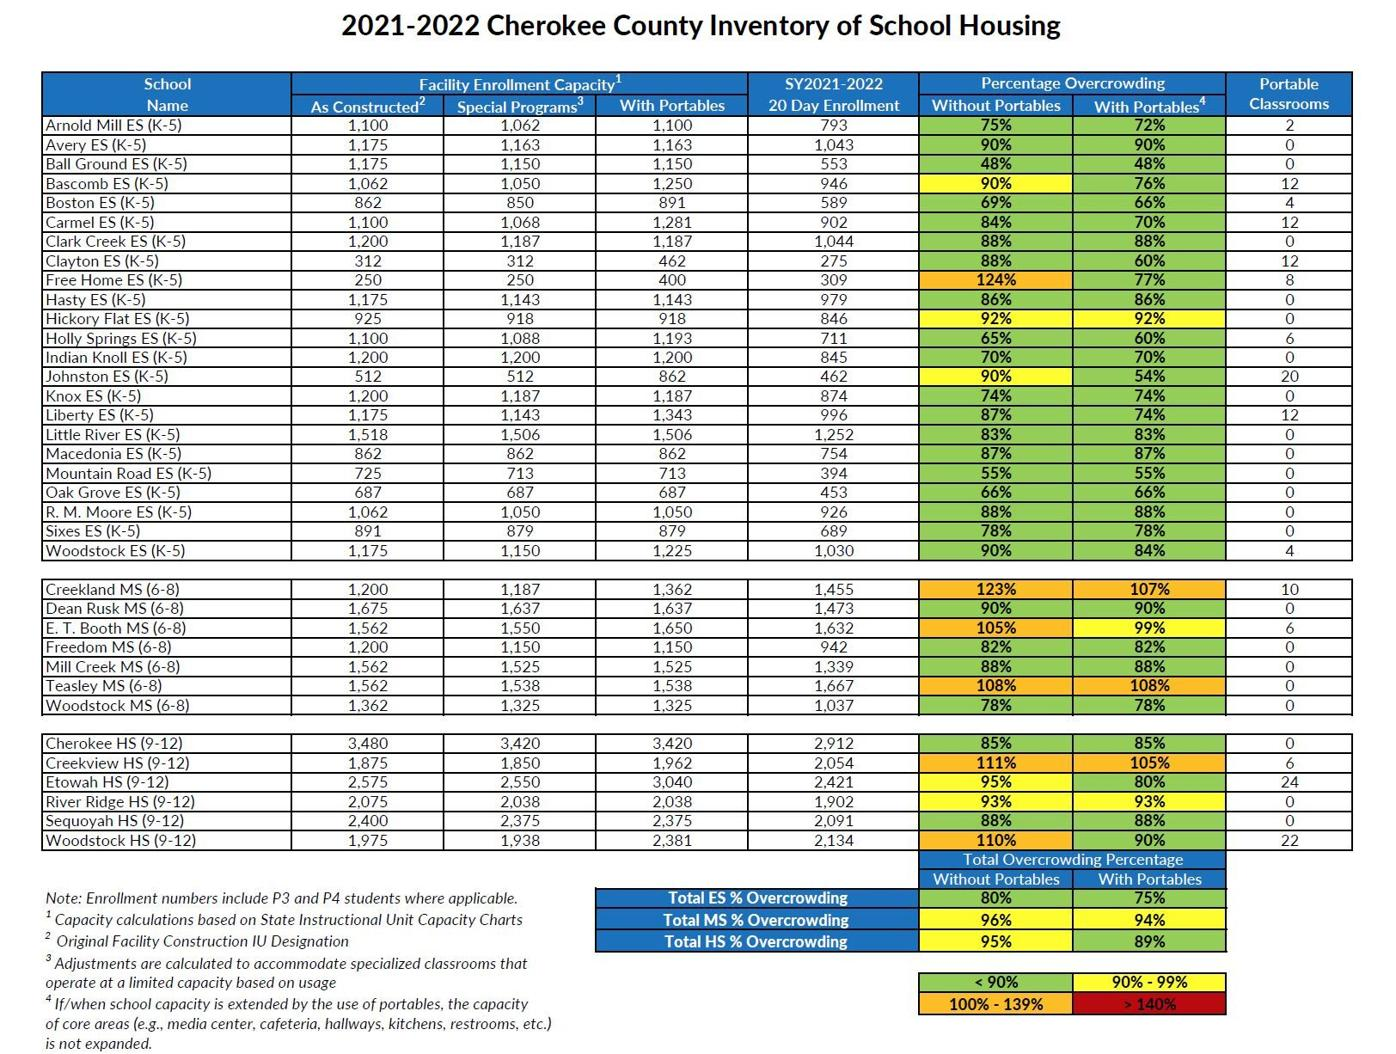 2021-22 Cherokee County Inventory of Student Housing.JPG